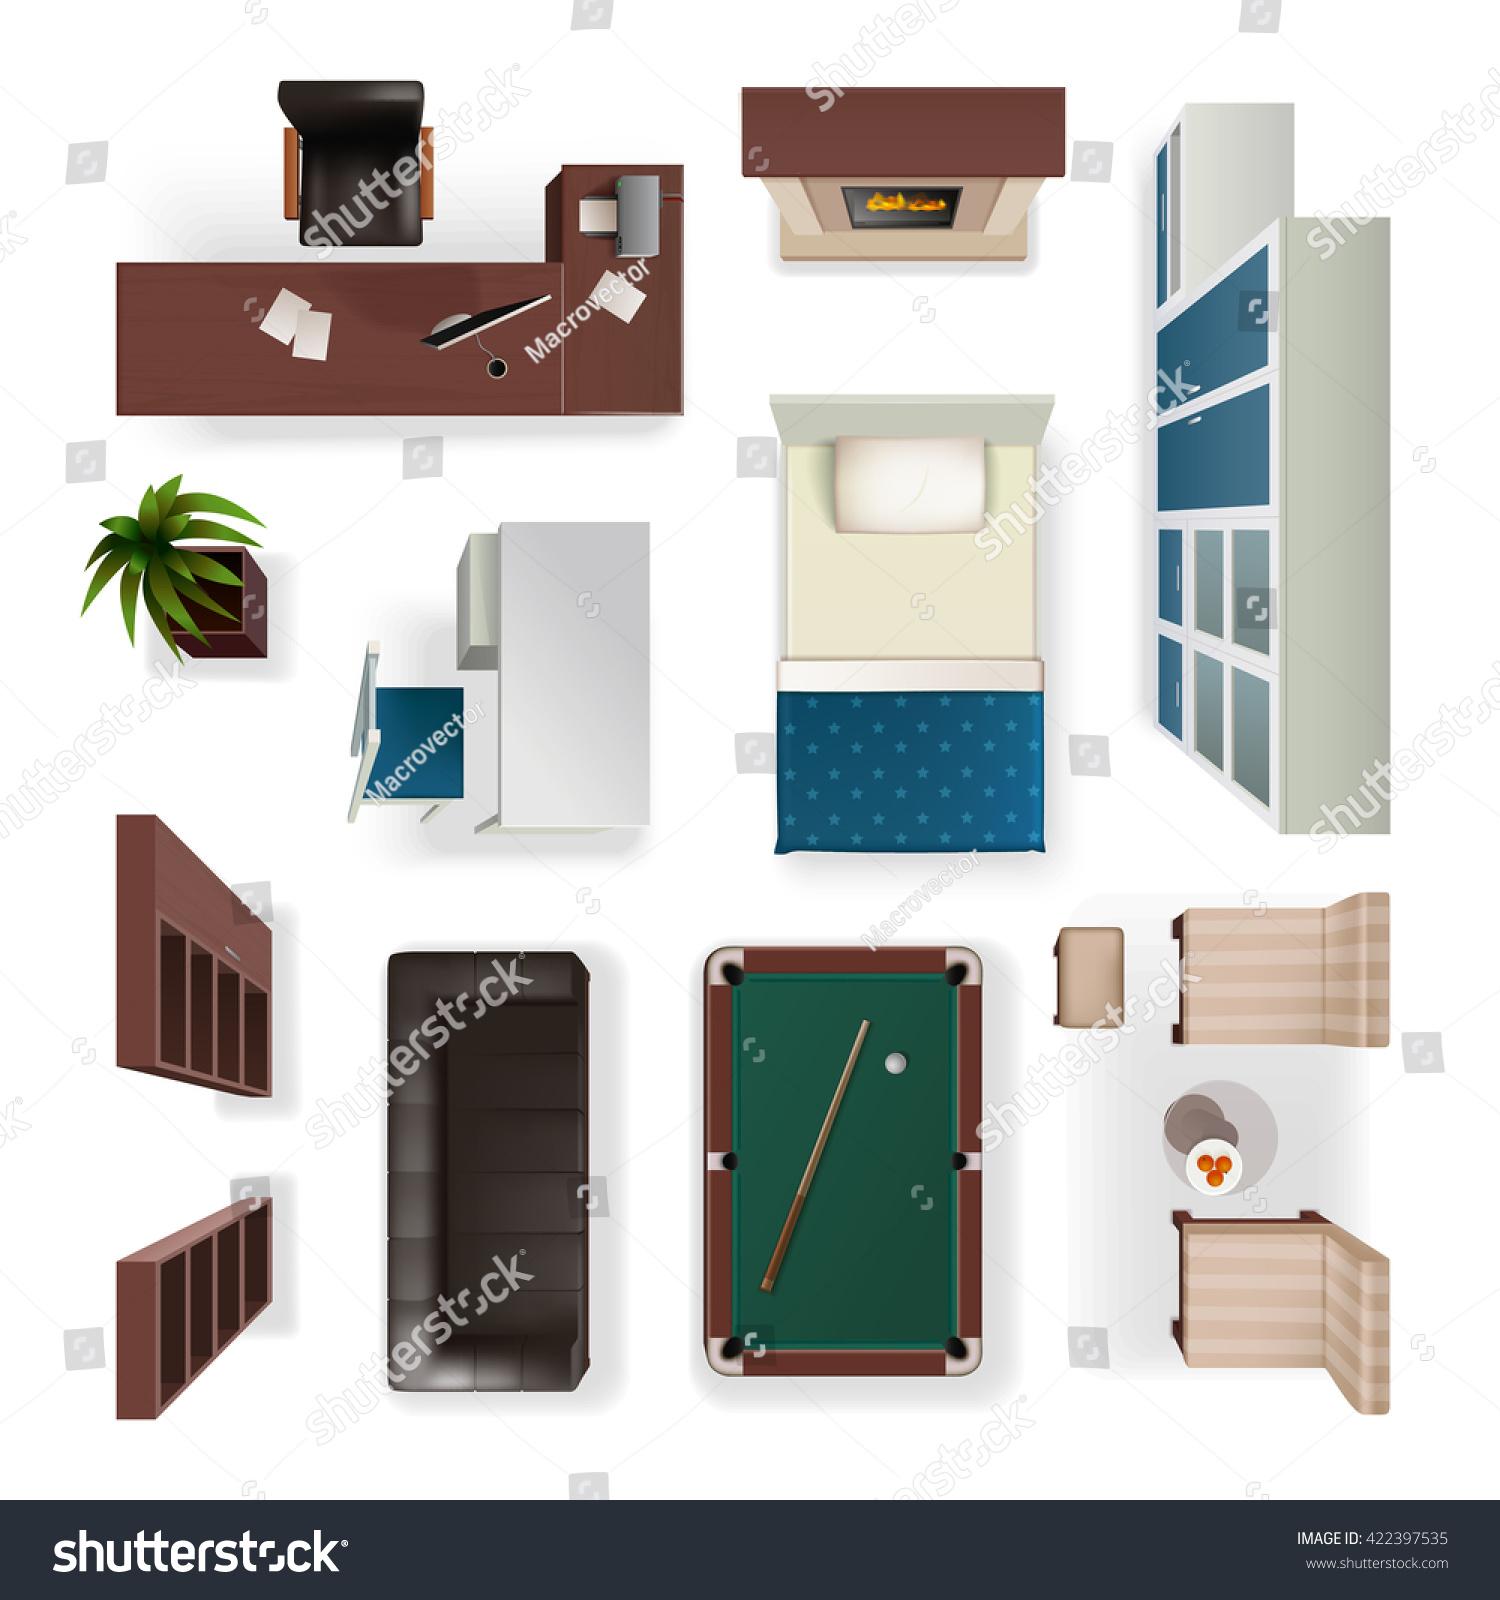 Kitchen Set Top View: Modern Interior Furniture Office Living Bedroom Stock